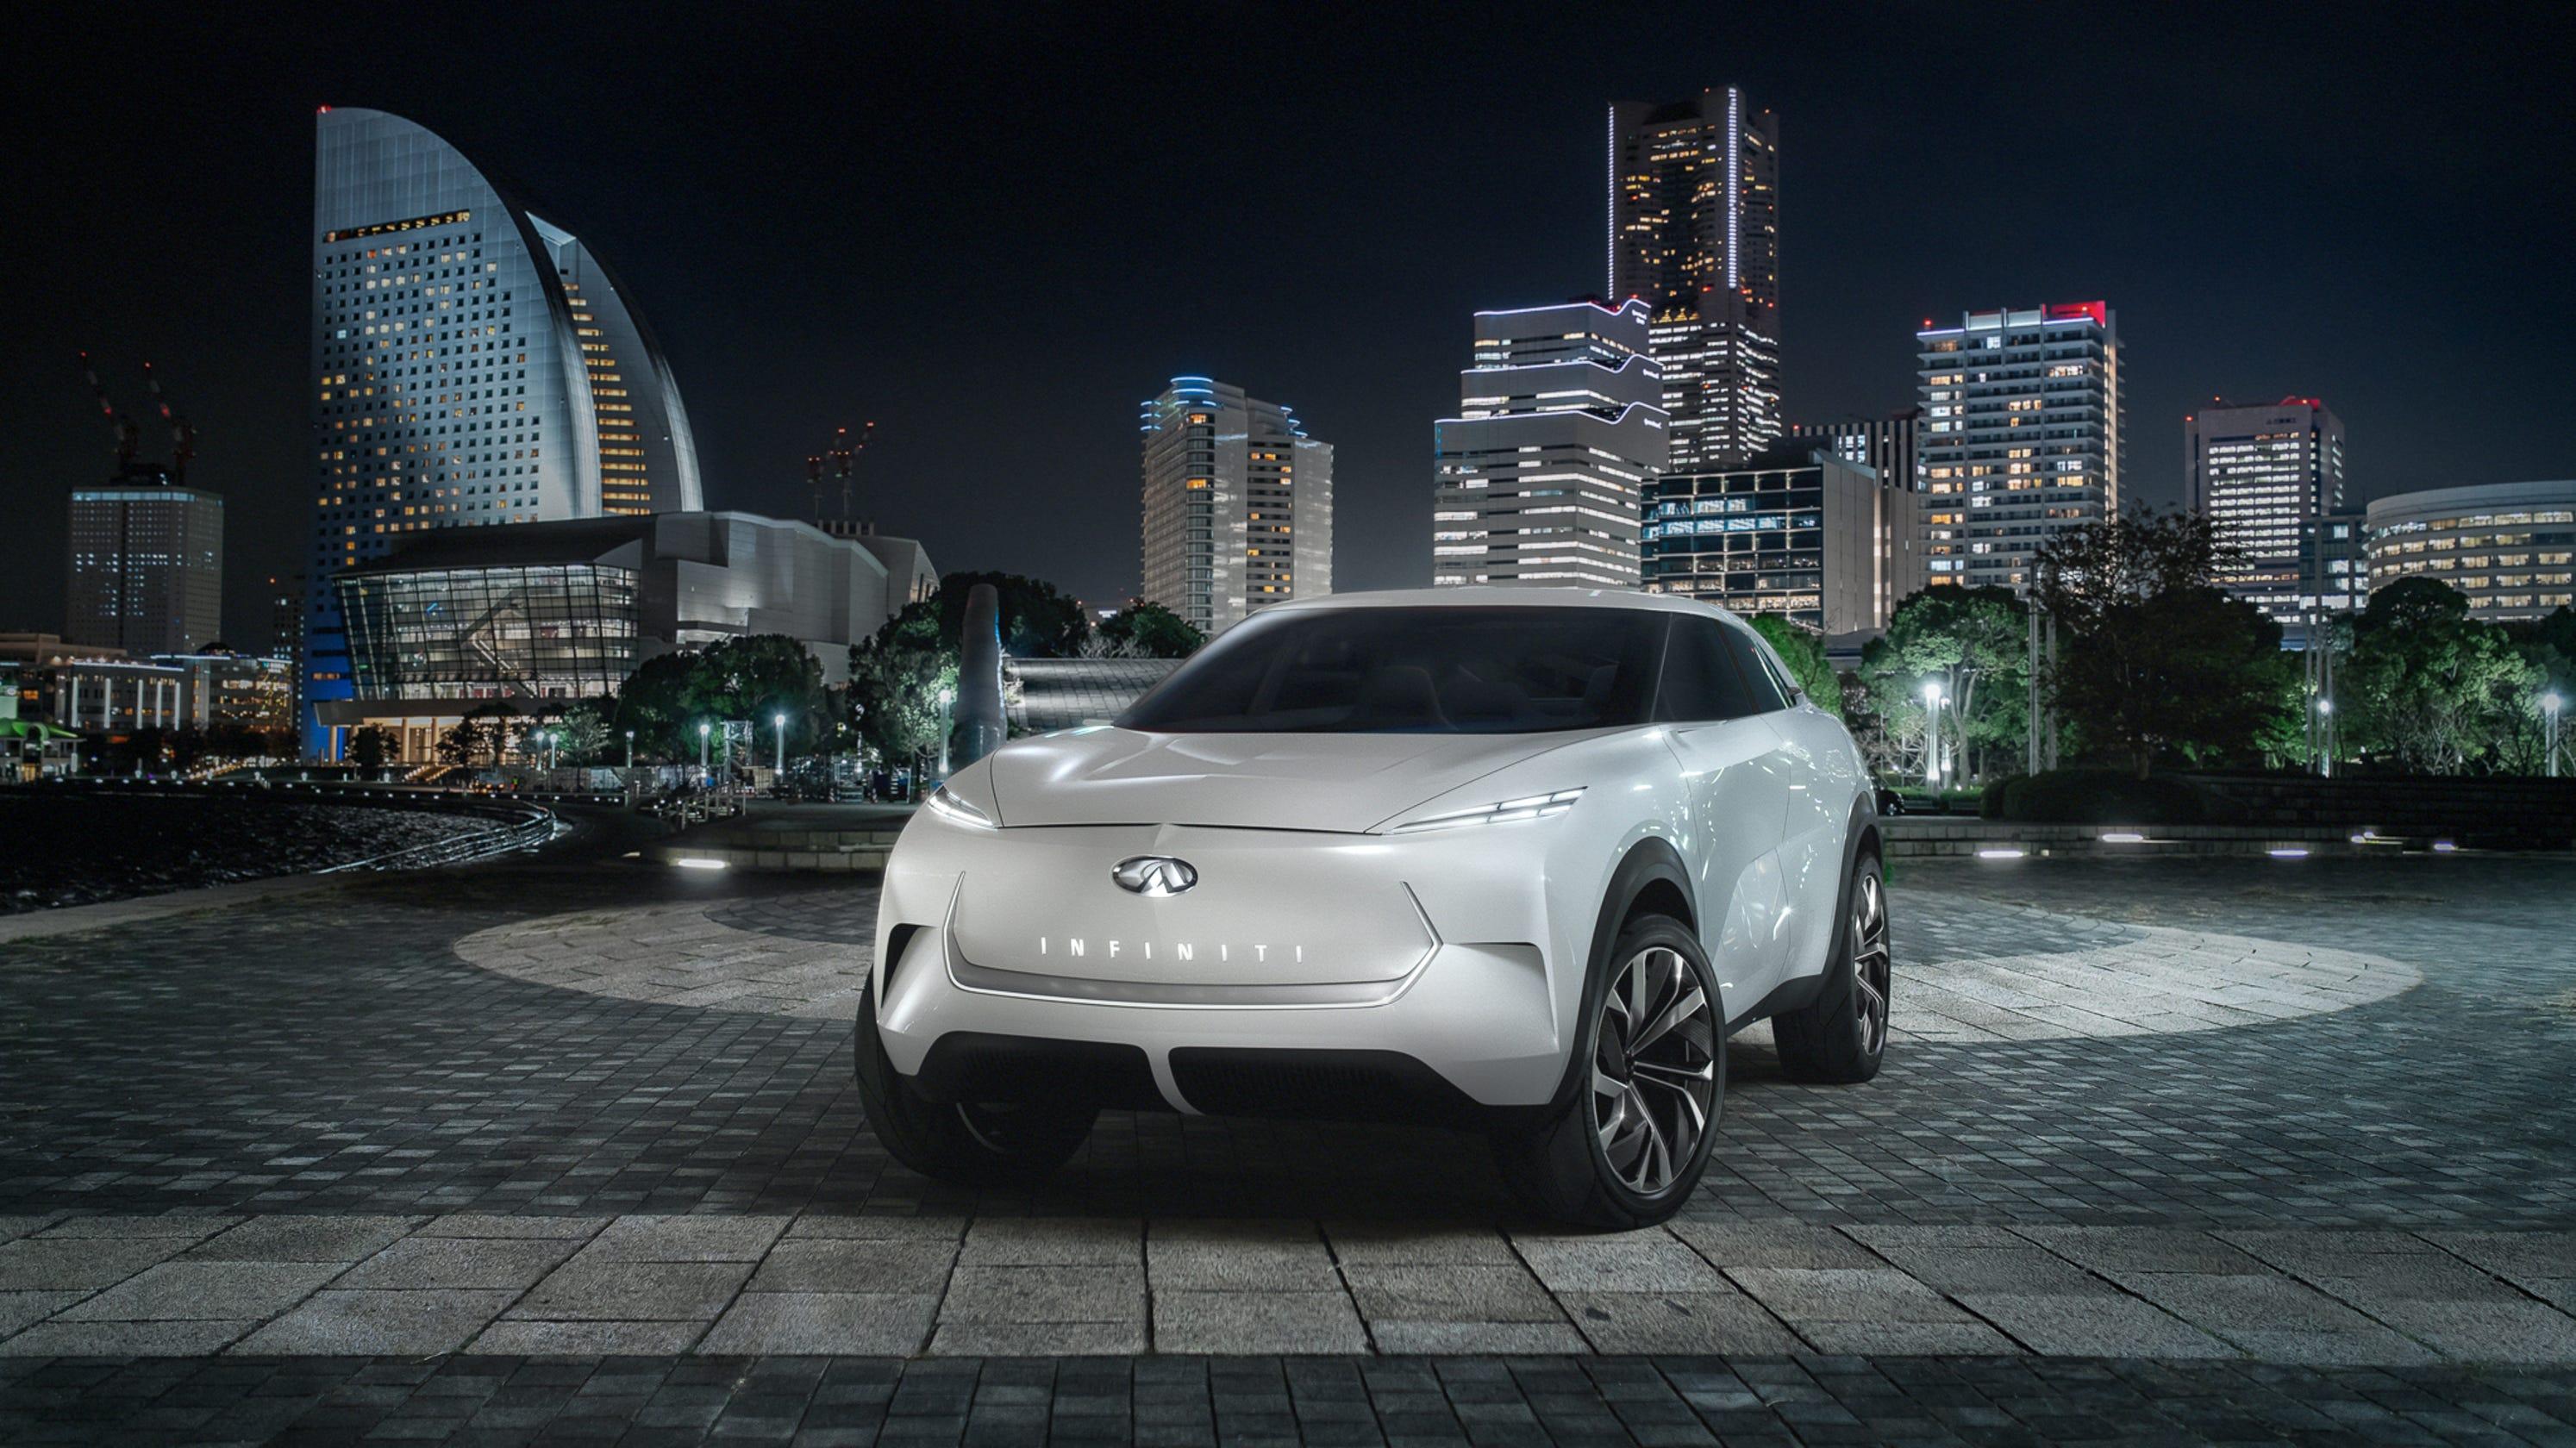 Detroit Auto Show 2019 Debuts Infiniti Qx Inspiration Revealed